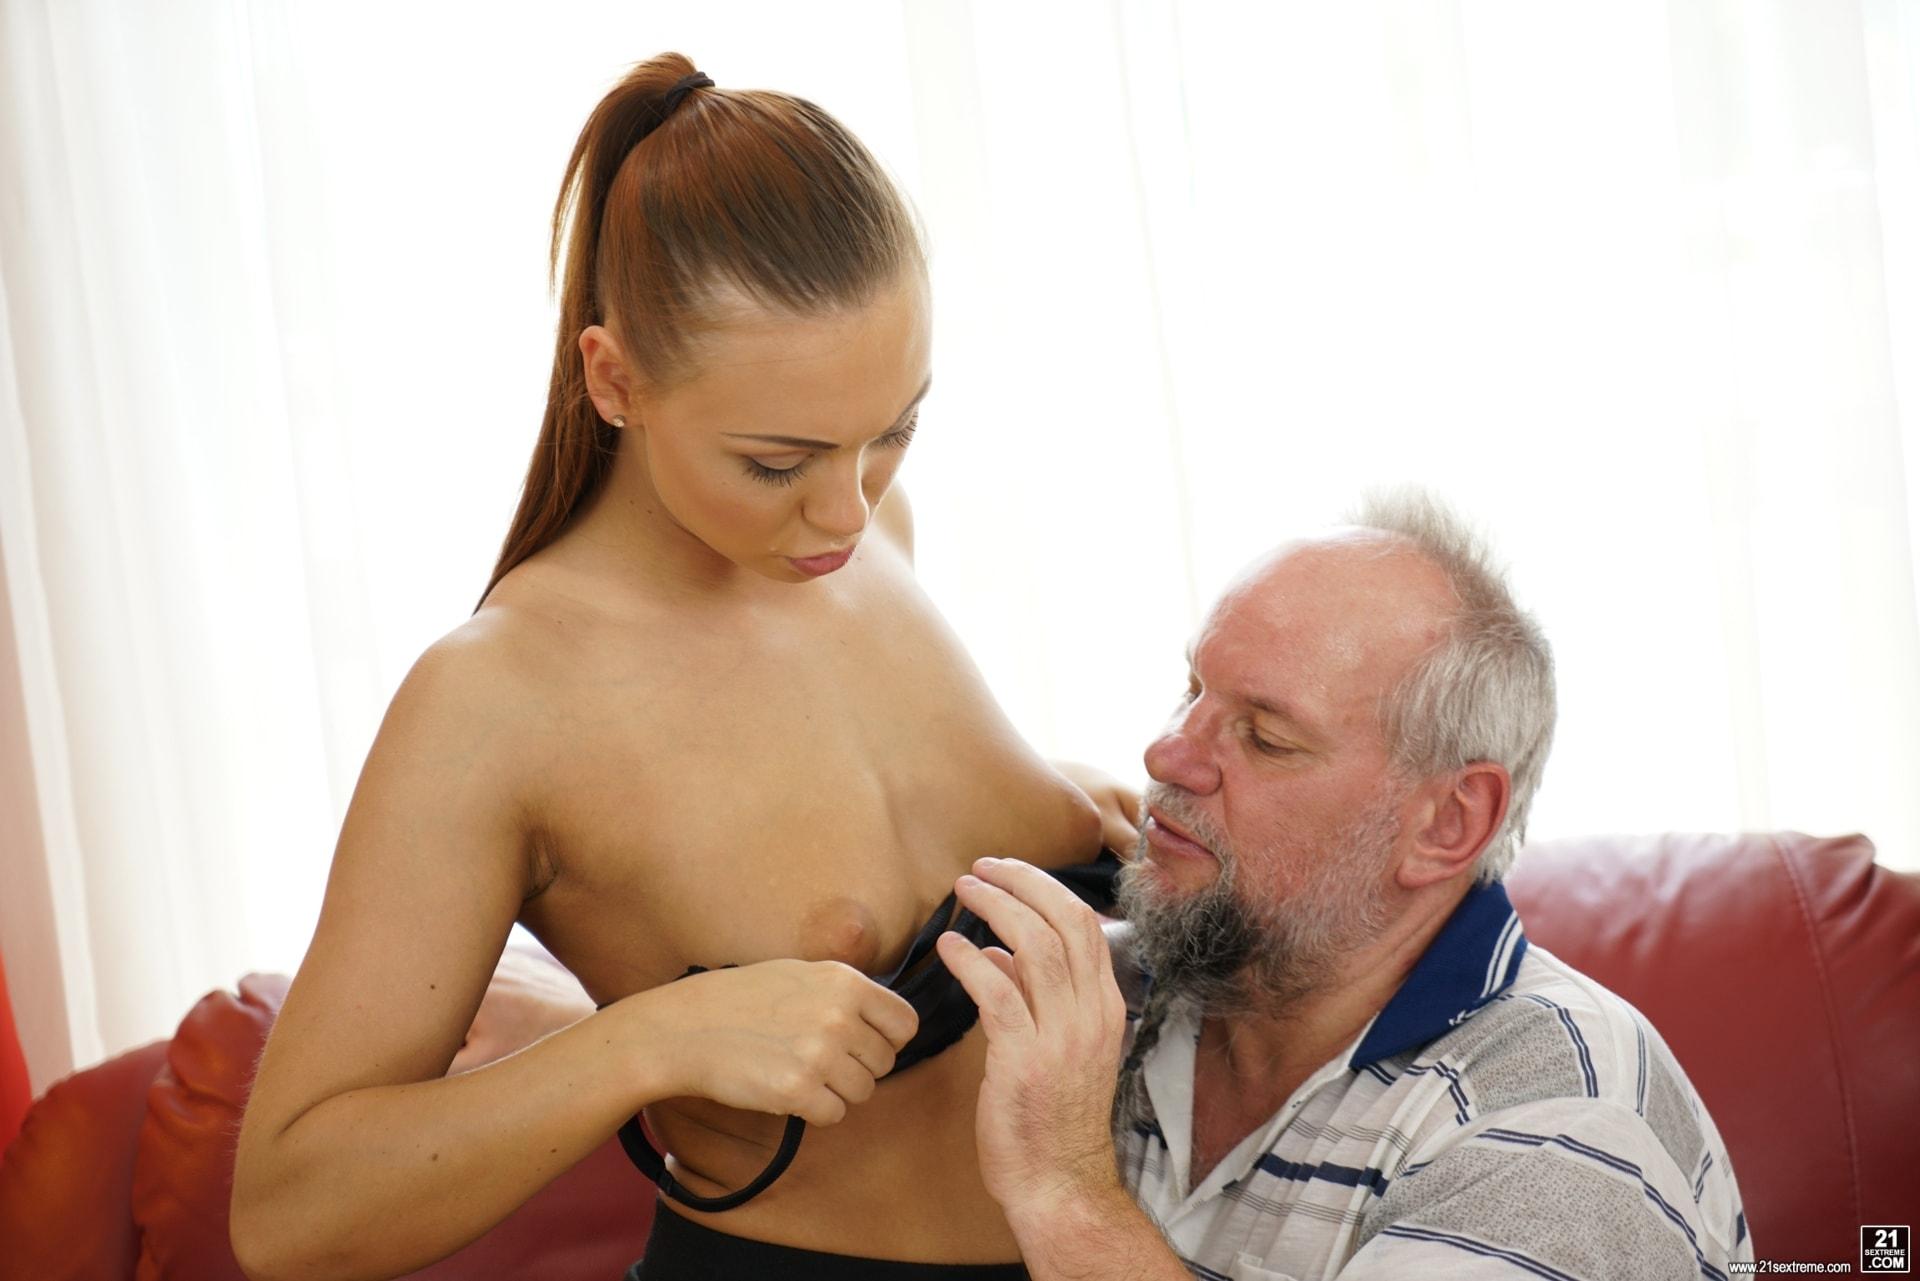 21Sextury 'Pleasing Naughty Grandpa' starring Ornella Morgan (Photo 138)